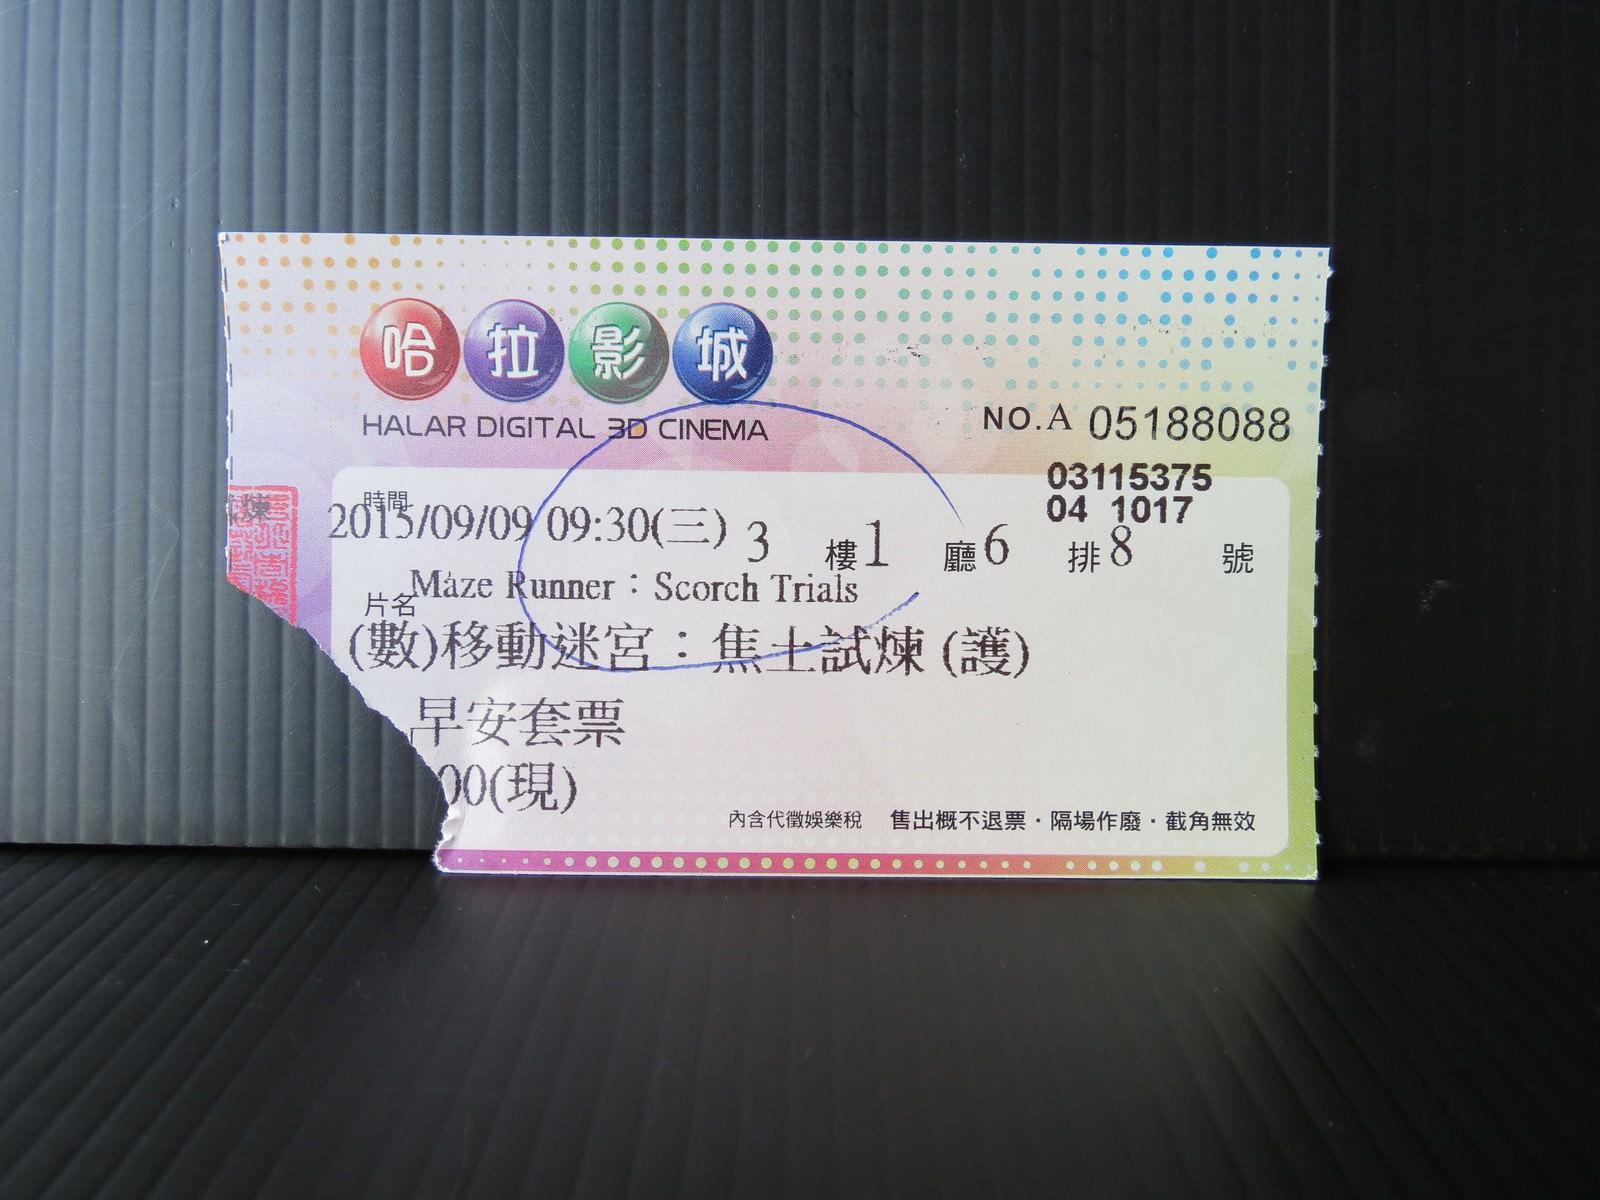 Movie, Maze Runner: The Scorch Trials(美國, 2015) / 移動迷宮:焦土試煉(台灣.香港) / 移动迷宫2(中國), 電影票